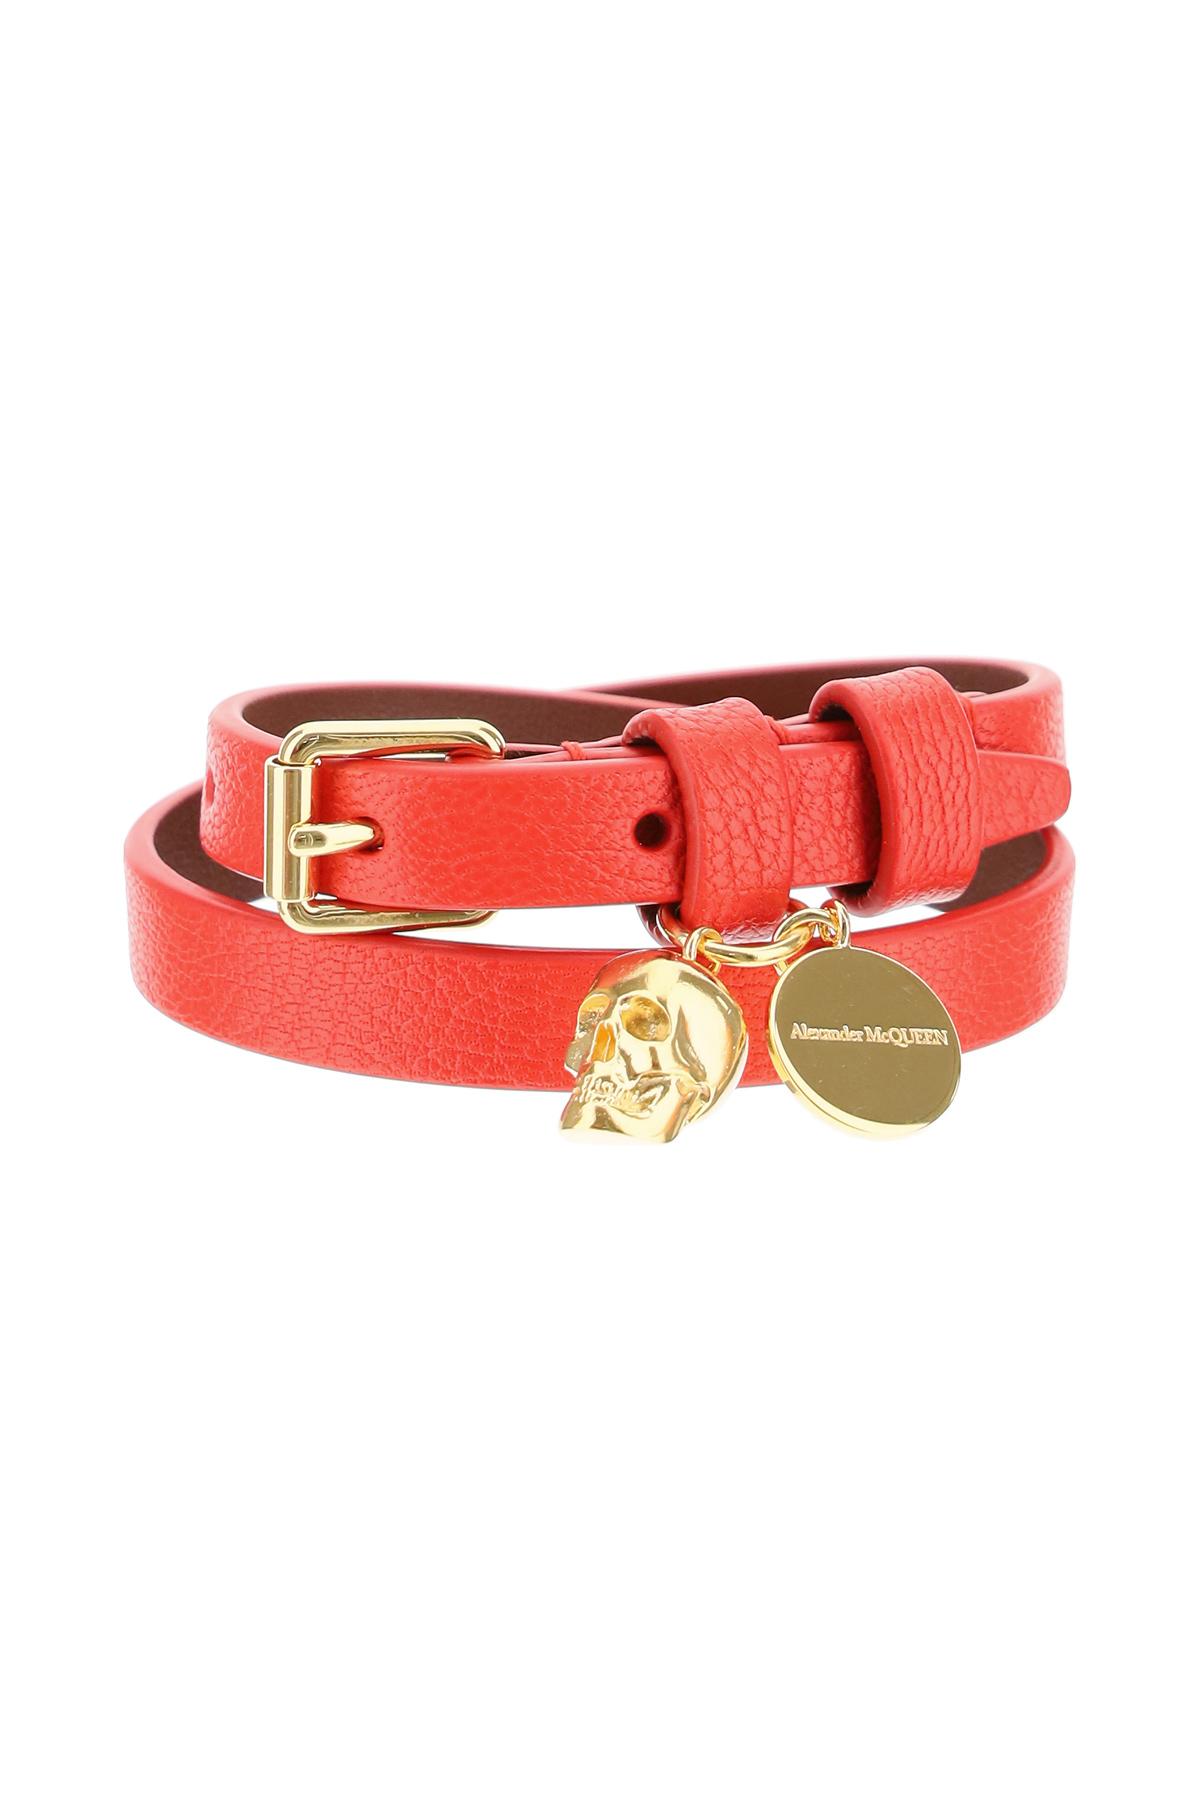 ALEXANDER MCQUEEN DOUBLE WRAP SKULL BRACELET OS Red Leather